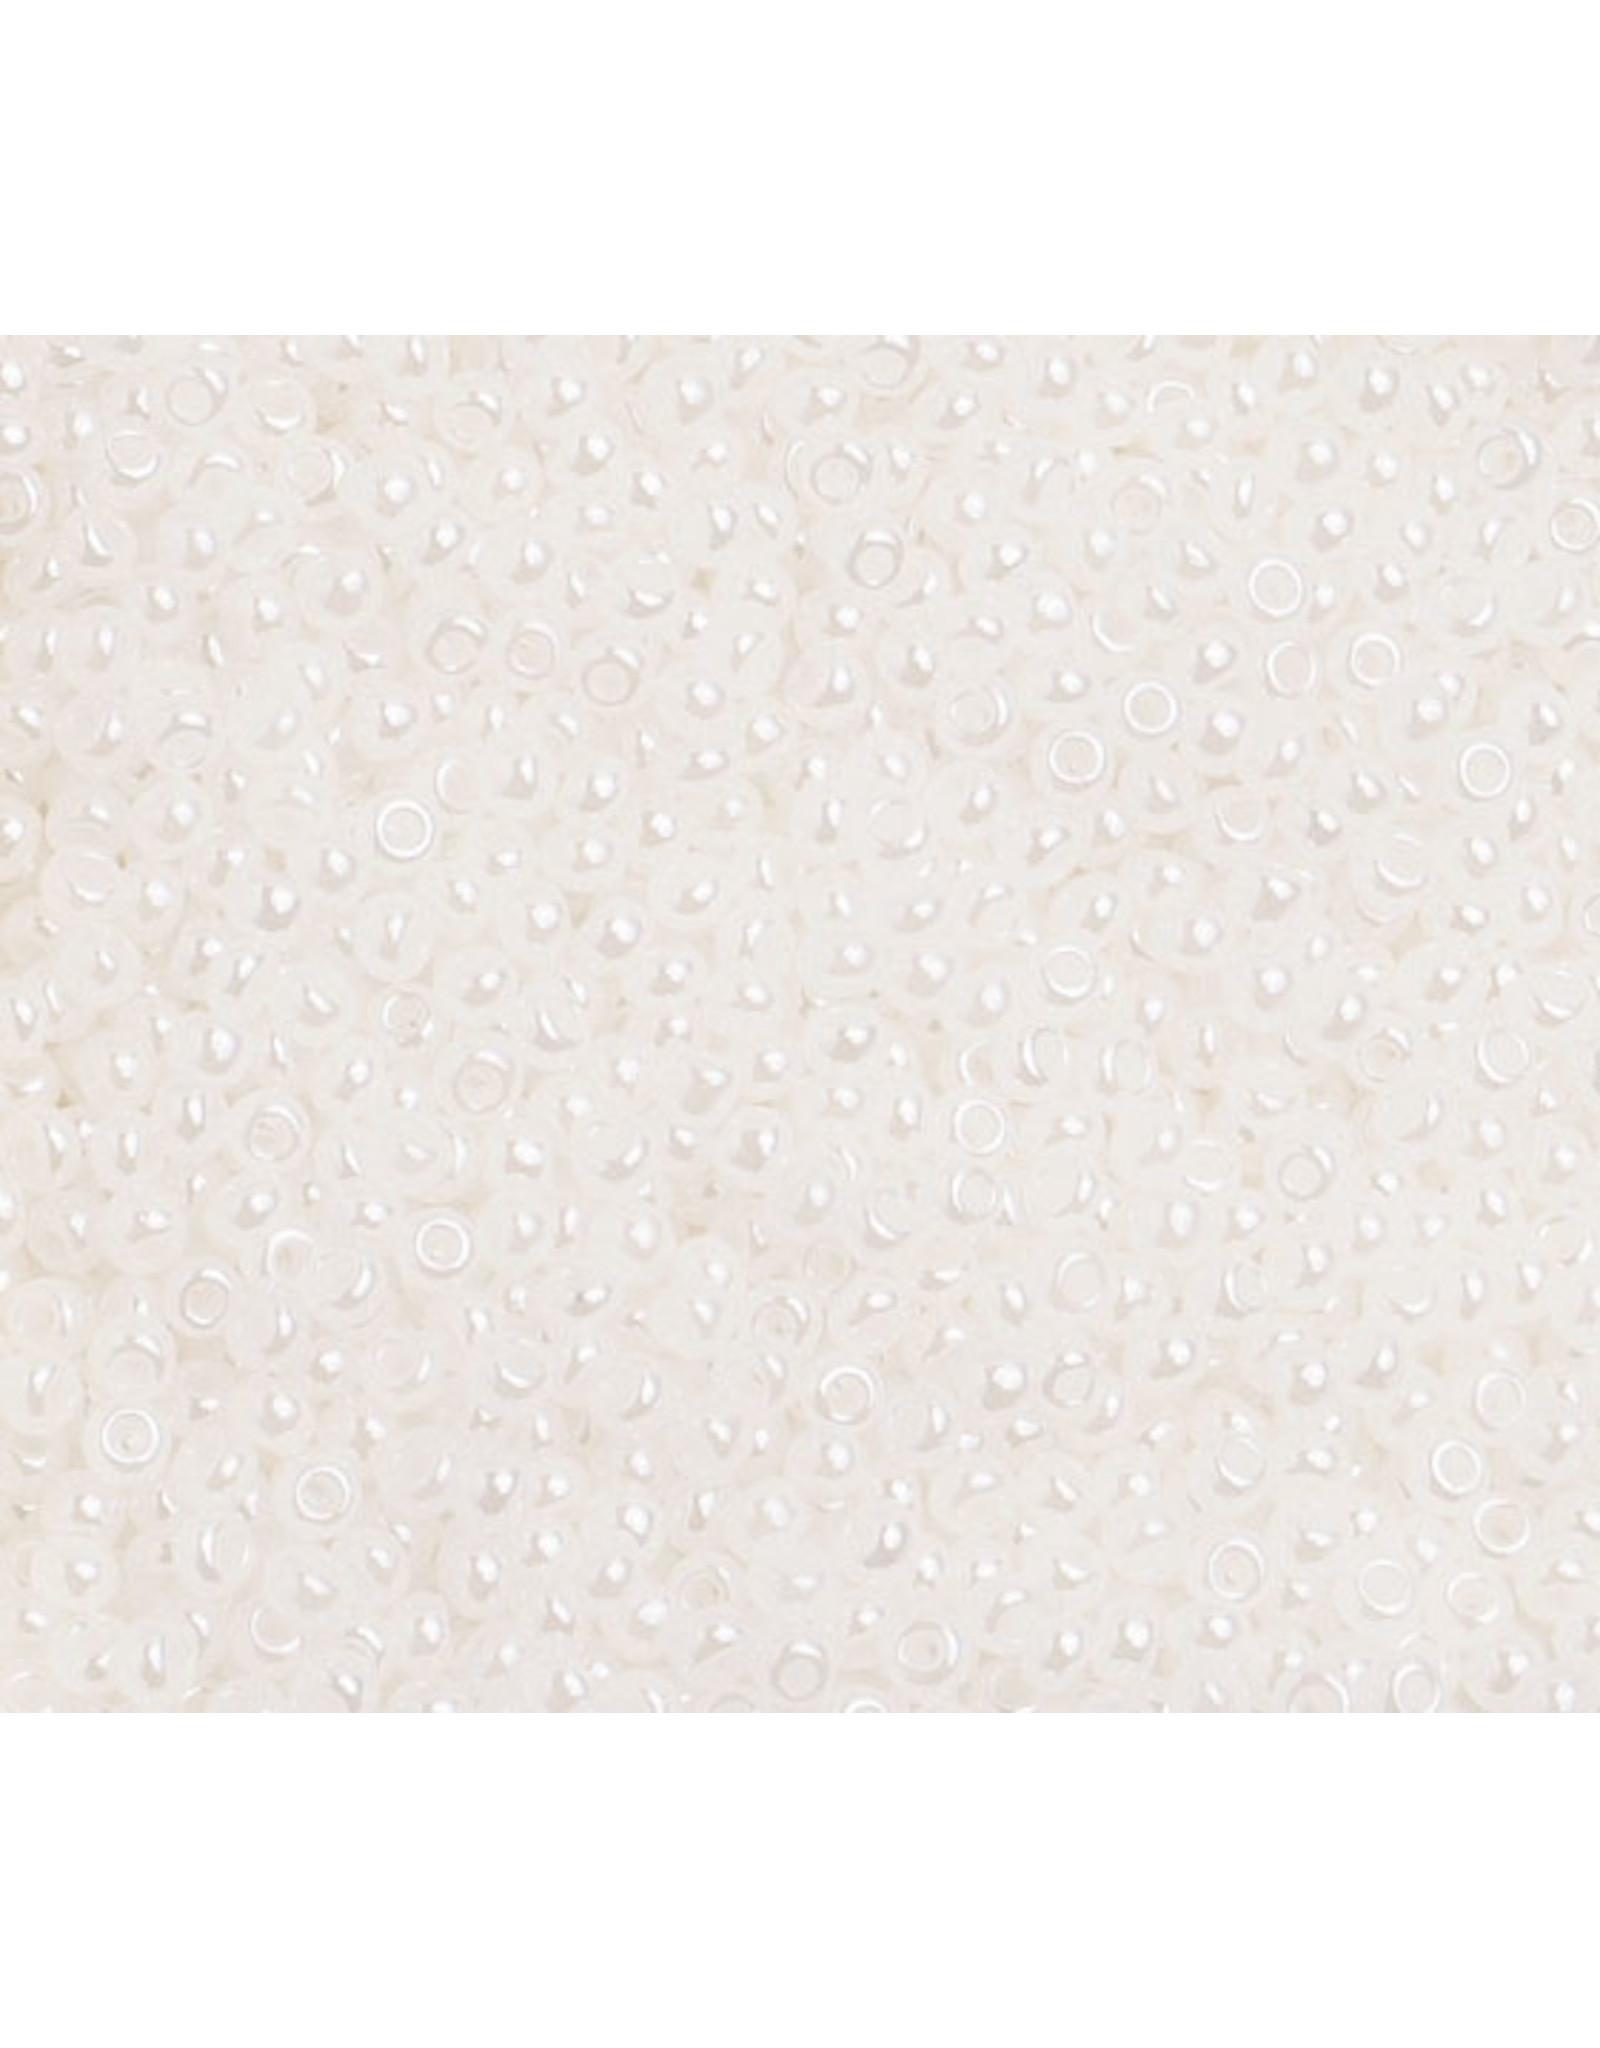 Czech 1476B 10   Seed 250g Opaque Pearl White